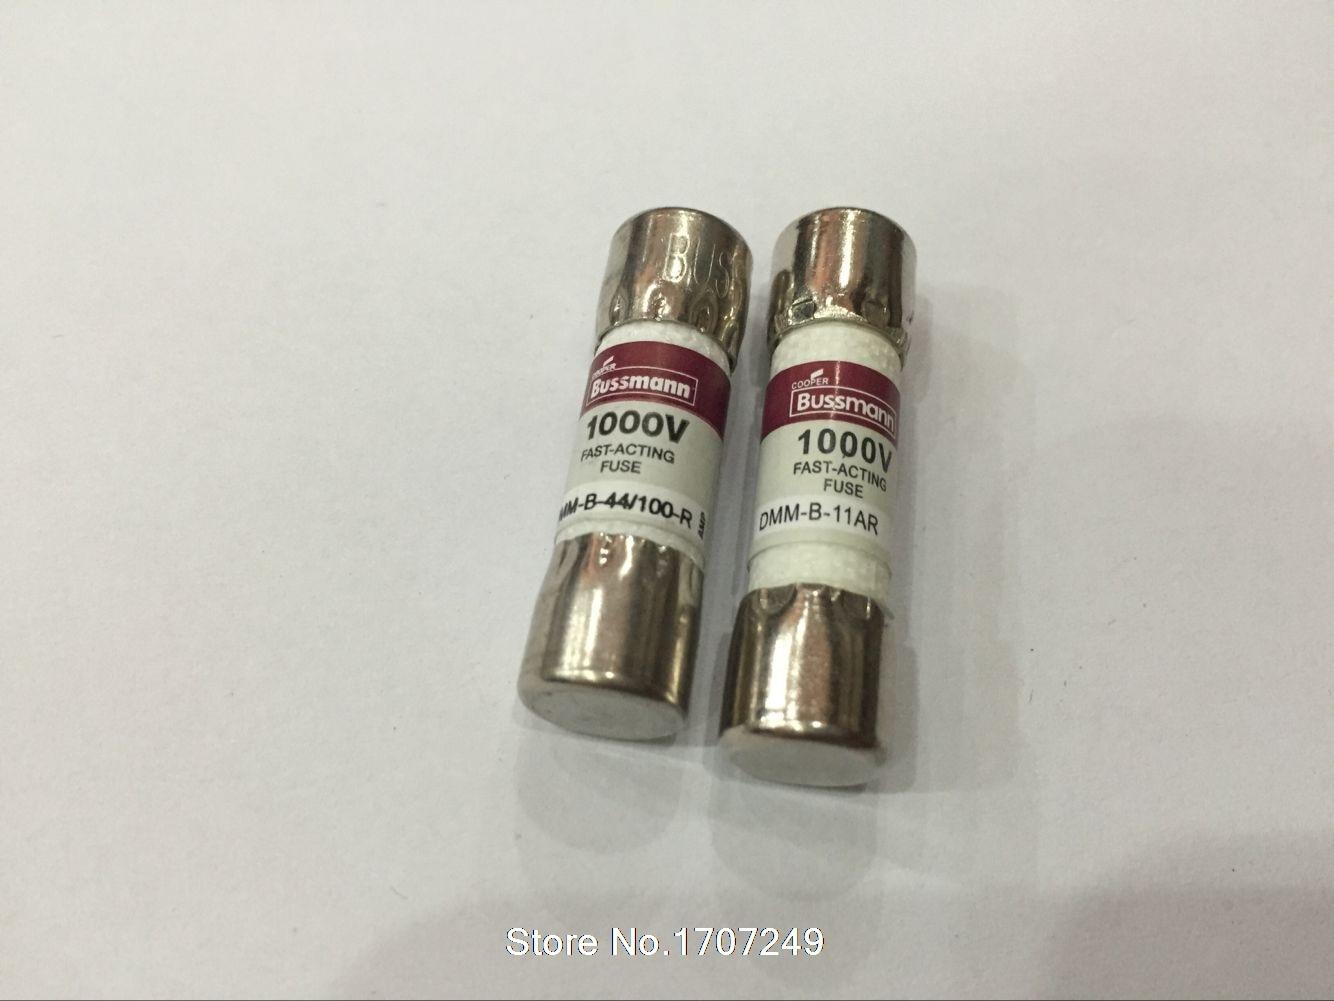 Bussmann Dmm-b-11a Dmm-b-44//100 44ma 1000vac//dc Buss Fuse for Fluke Multimeter